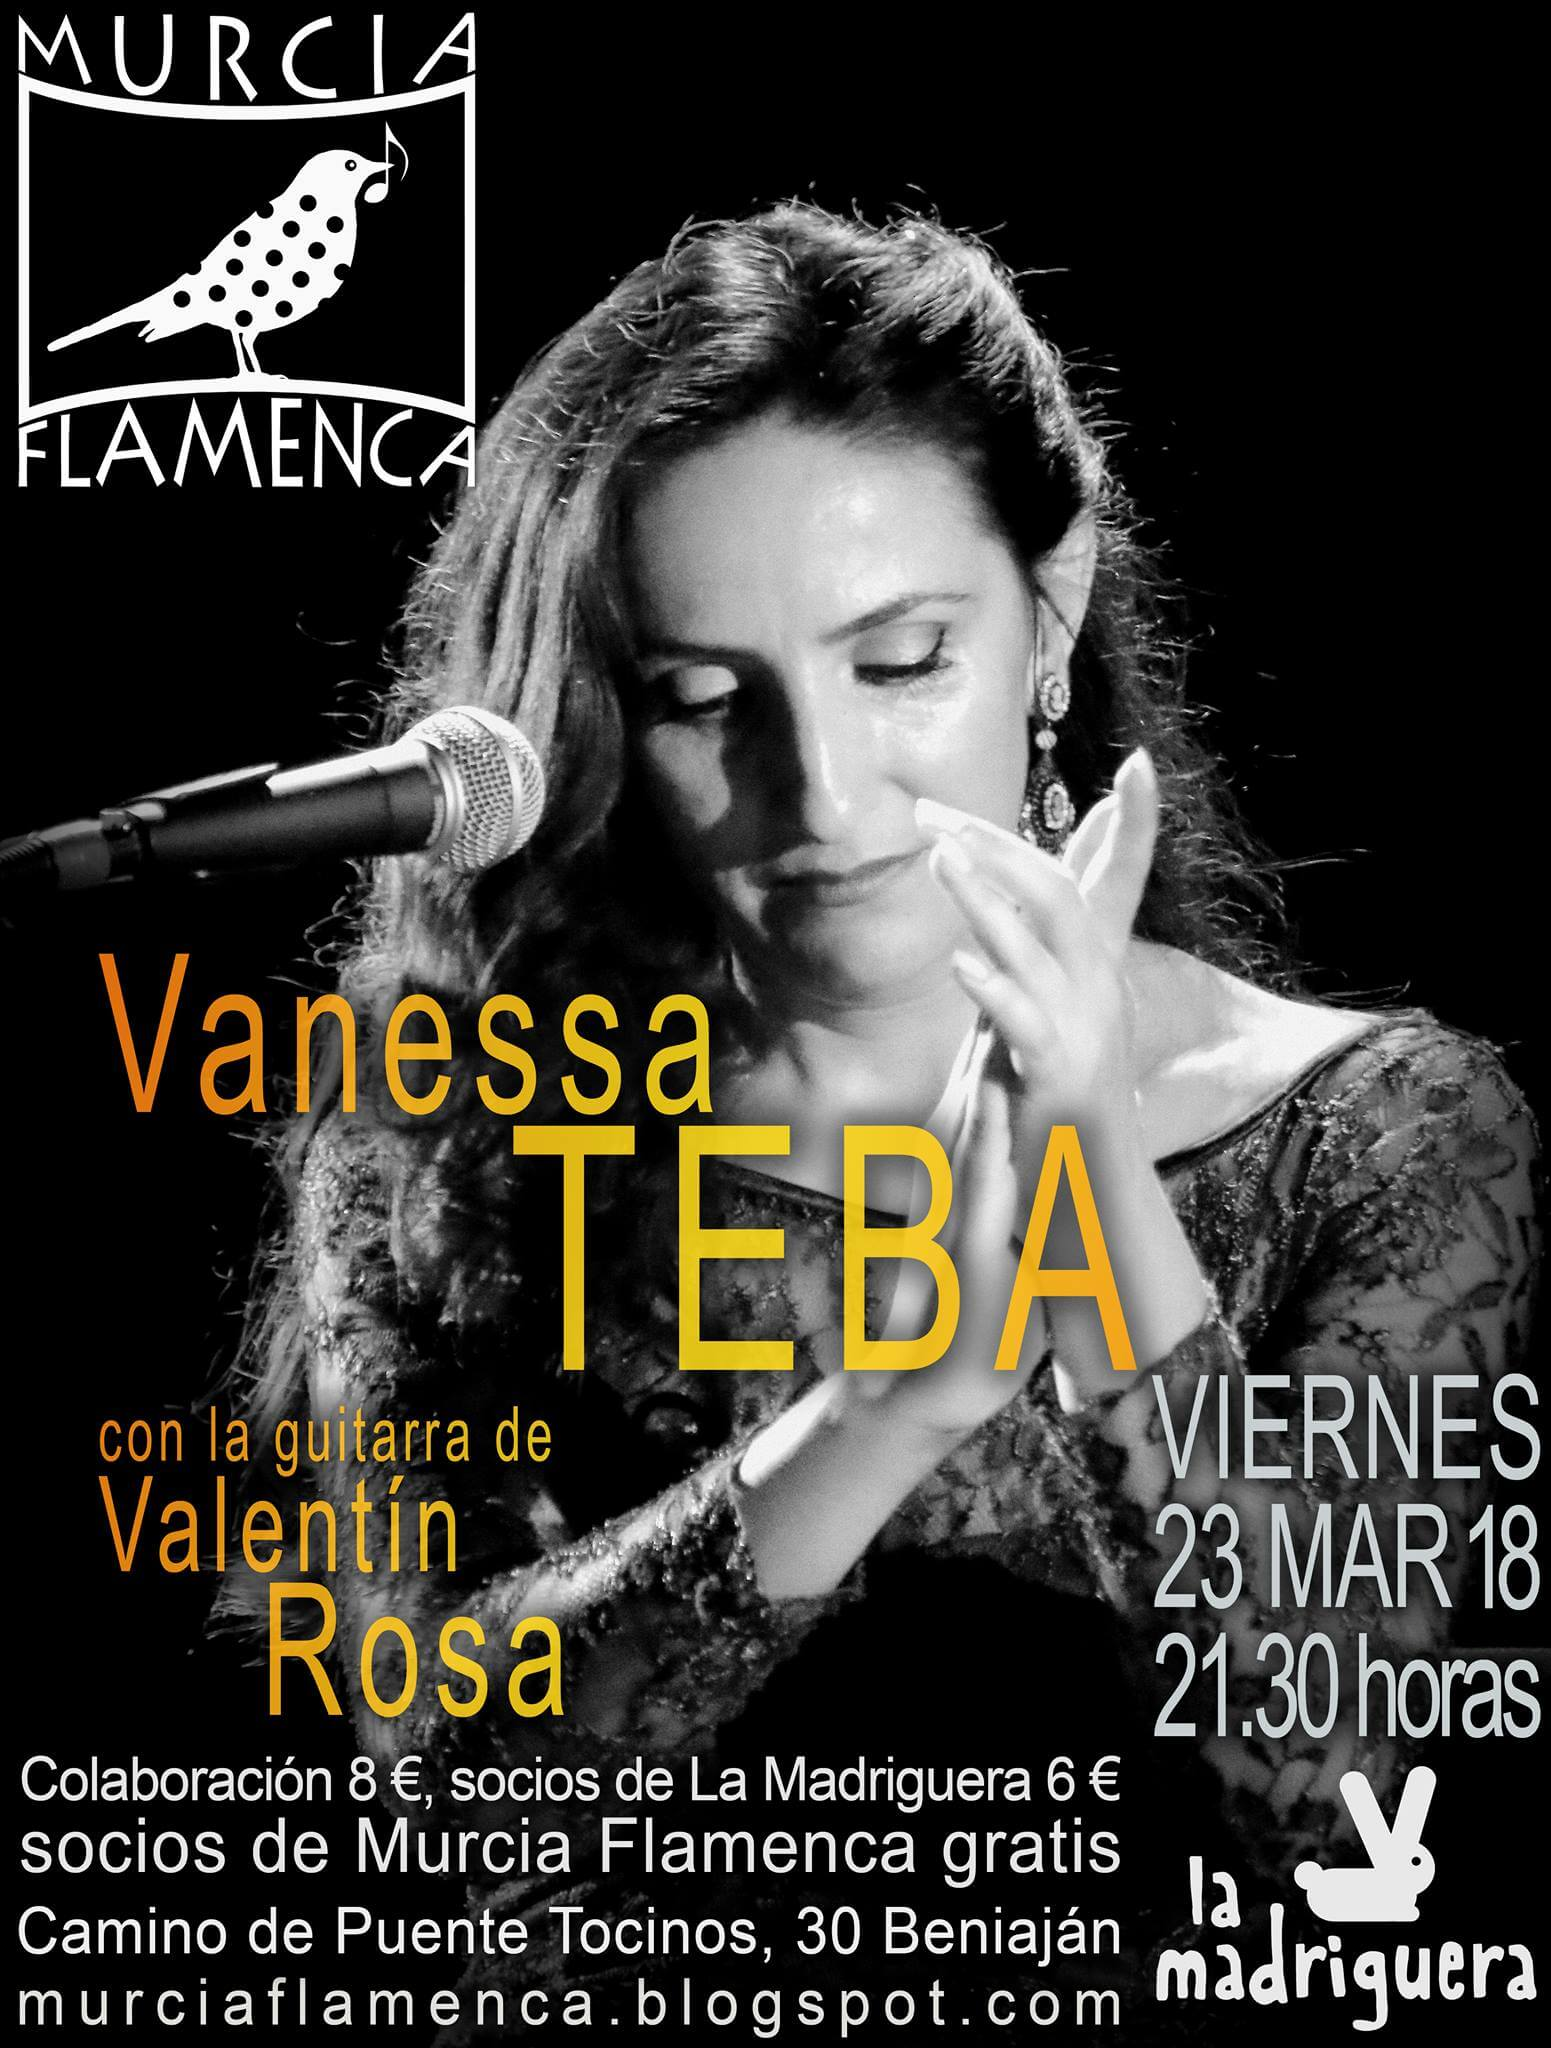 Vanessa Teba Murcia Flamenca